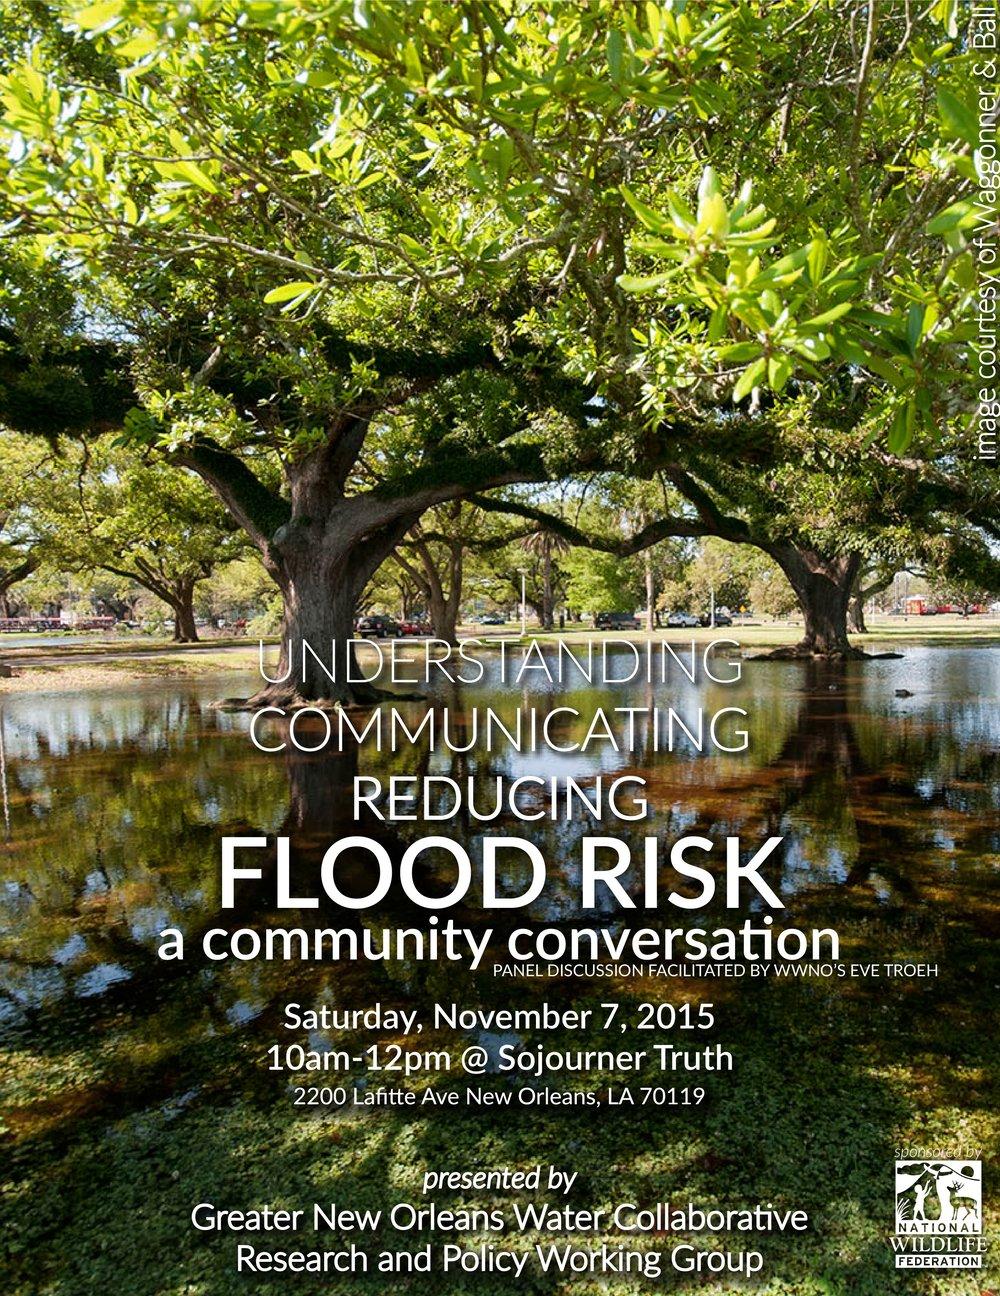 GNOWC_FloodRiskCommunityConversation_11.7.15.jpg